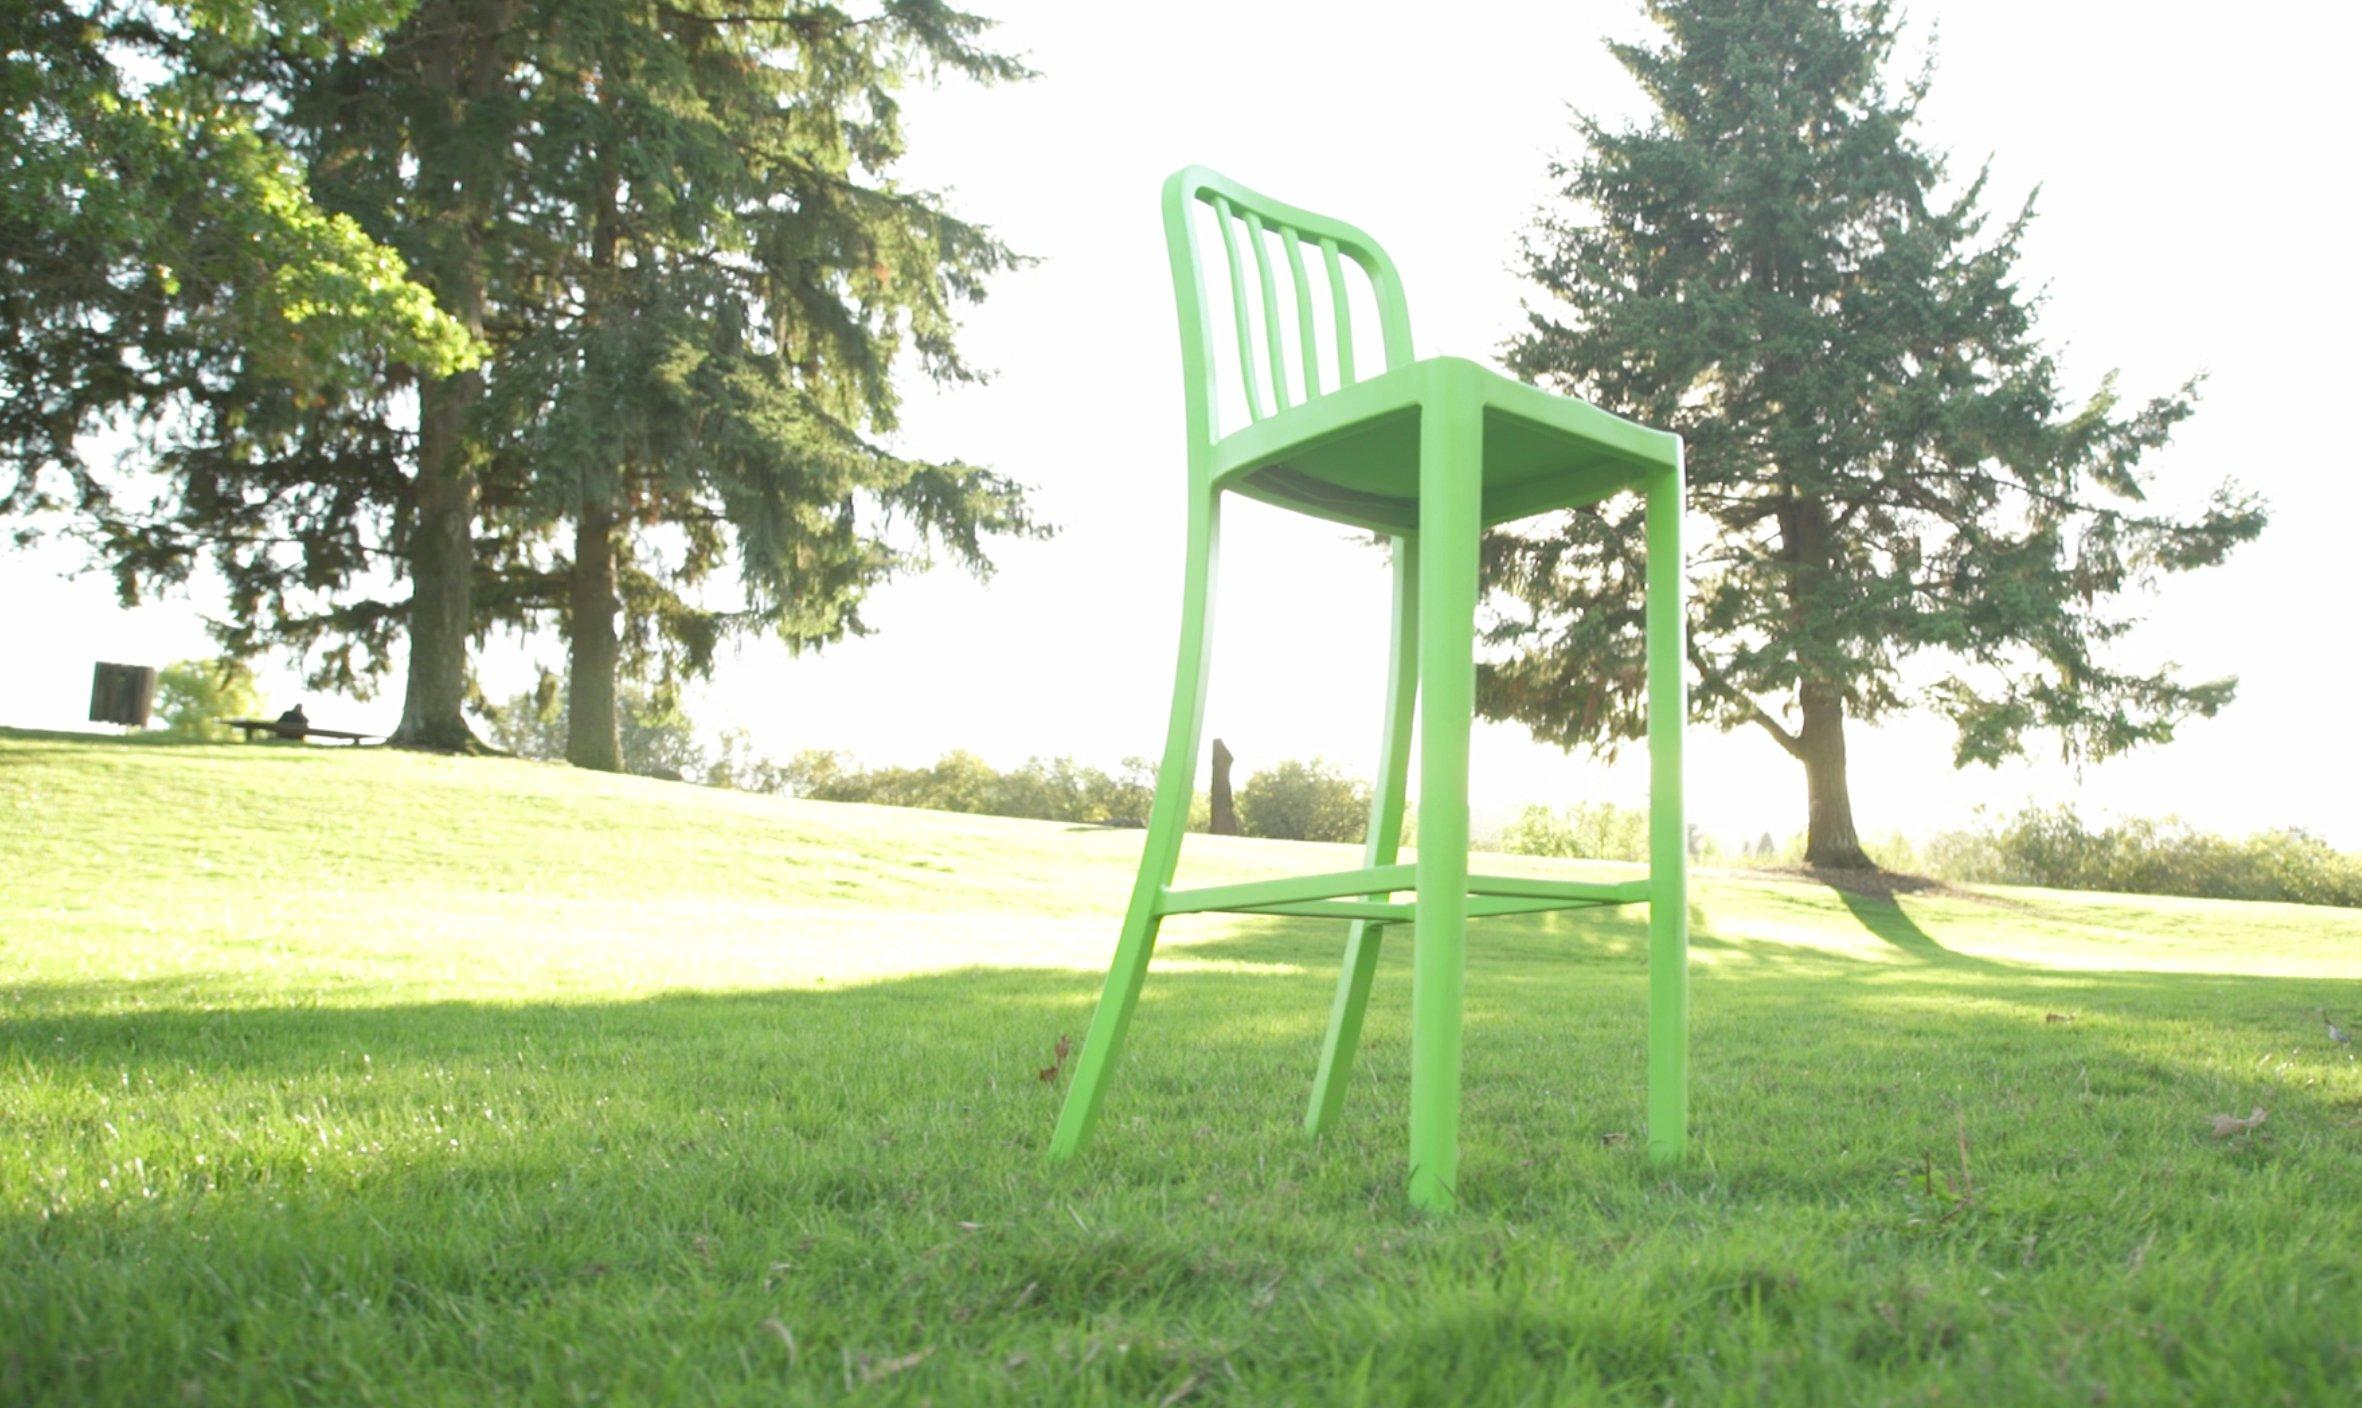 greenchair_30425160962_o